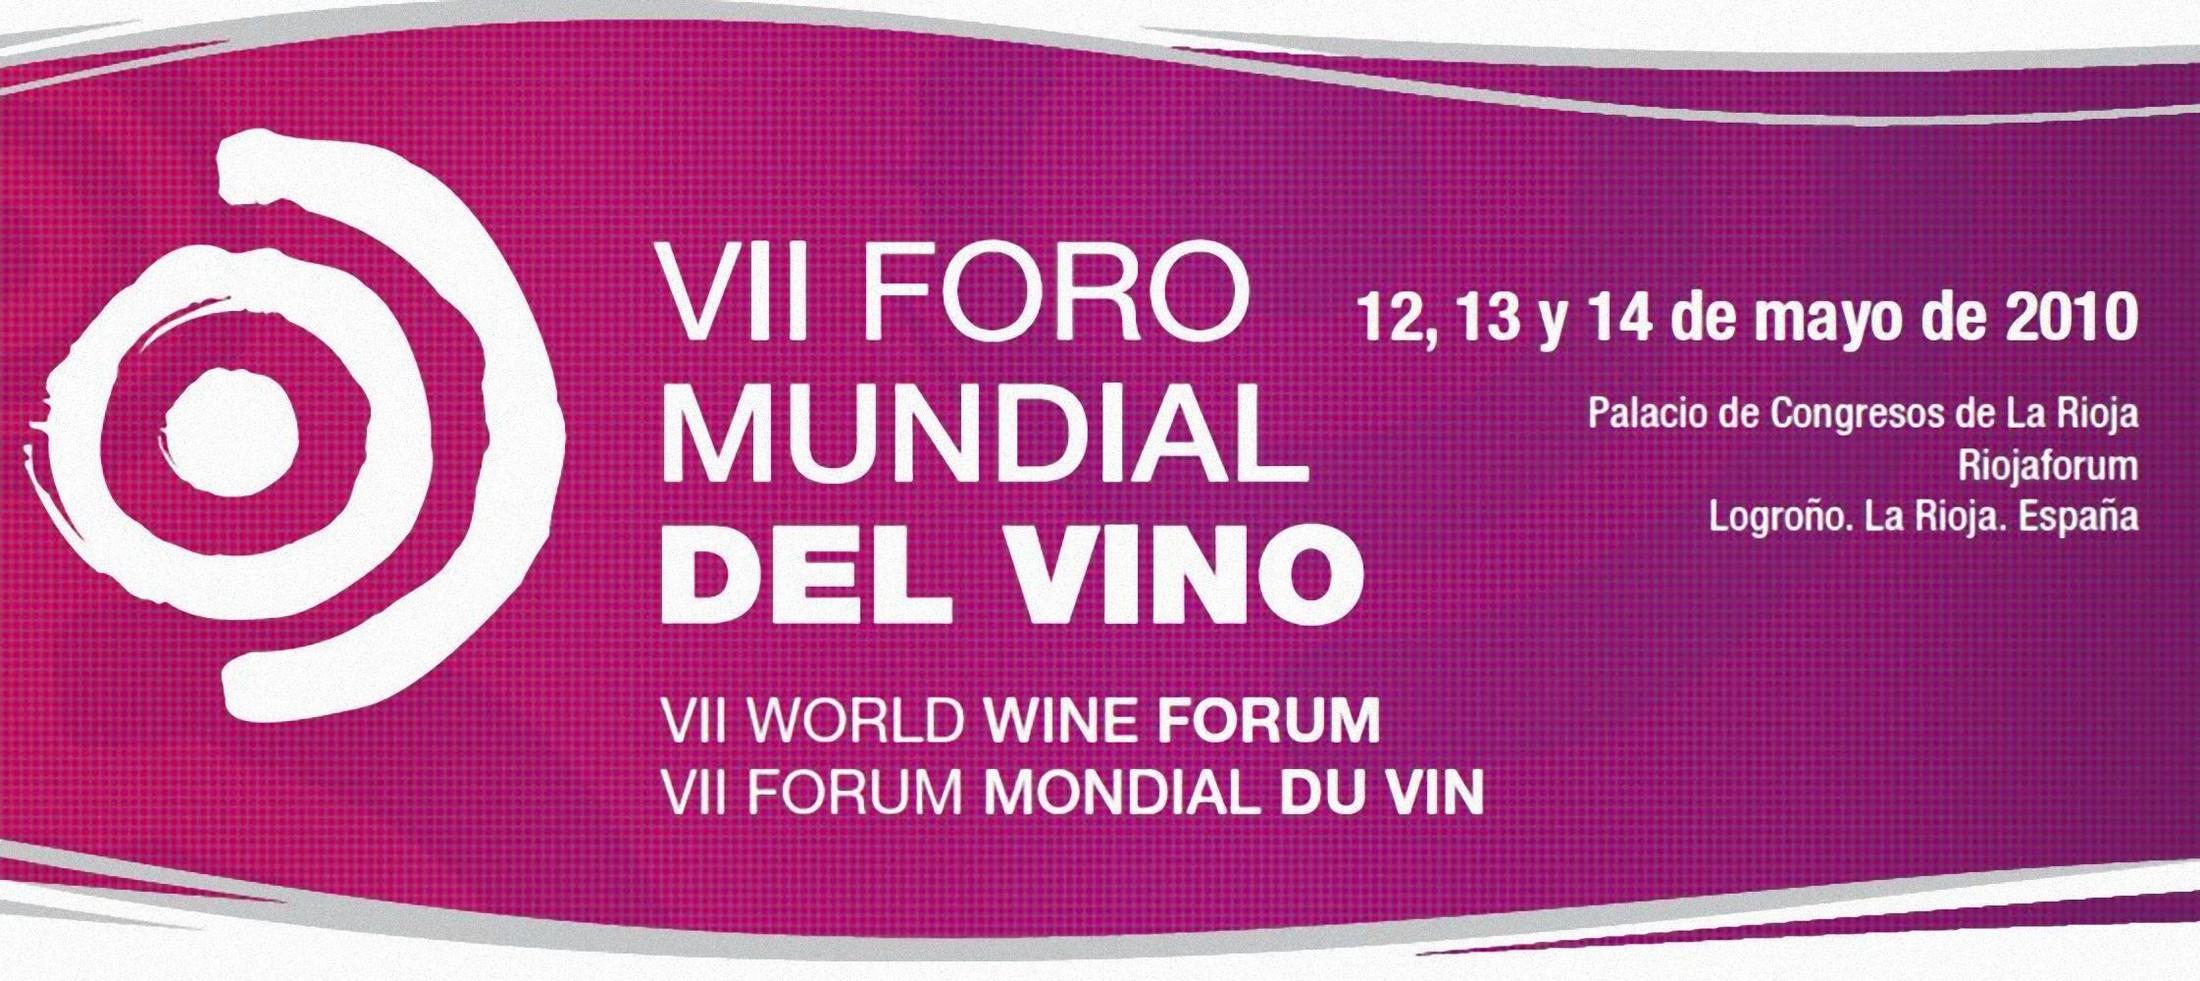 VII Foro Mundial del Vino